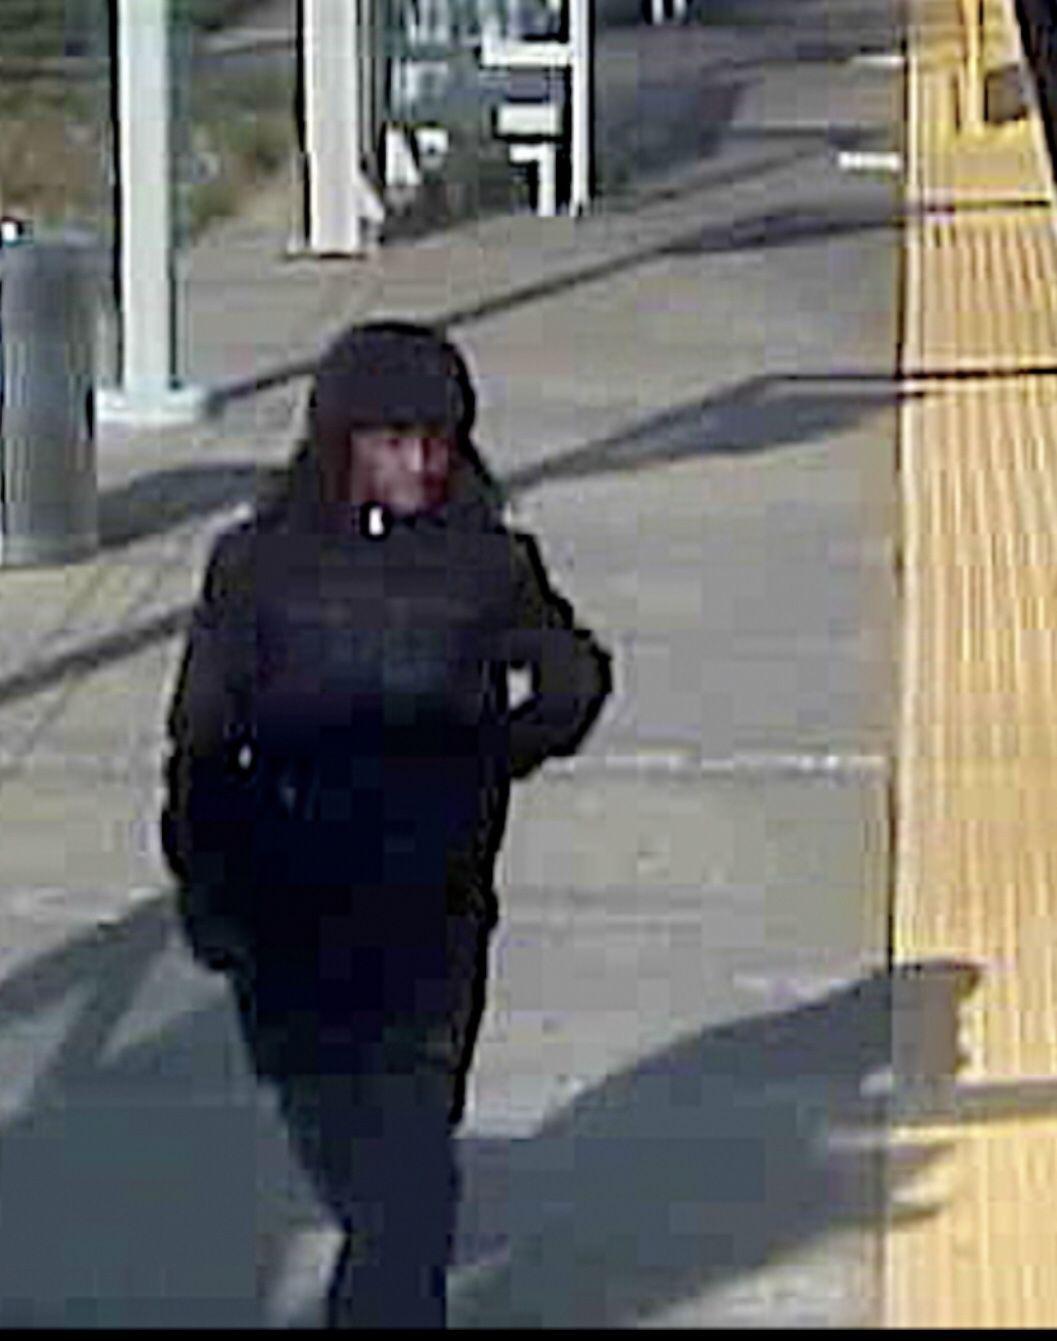 Suspect in Wellston killing